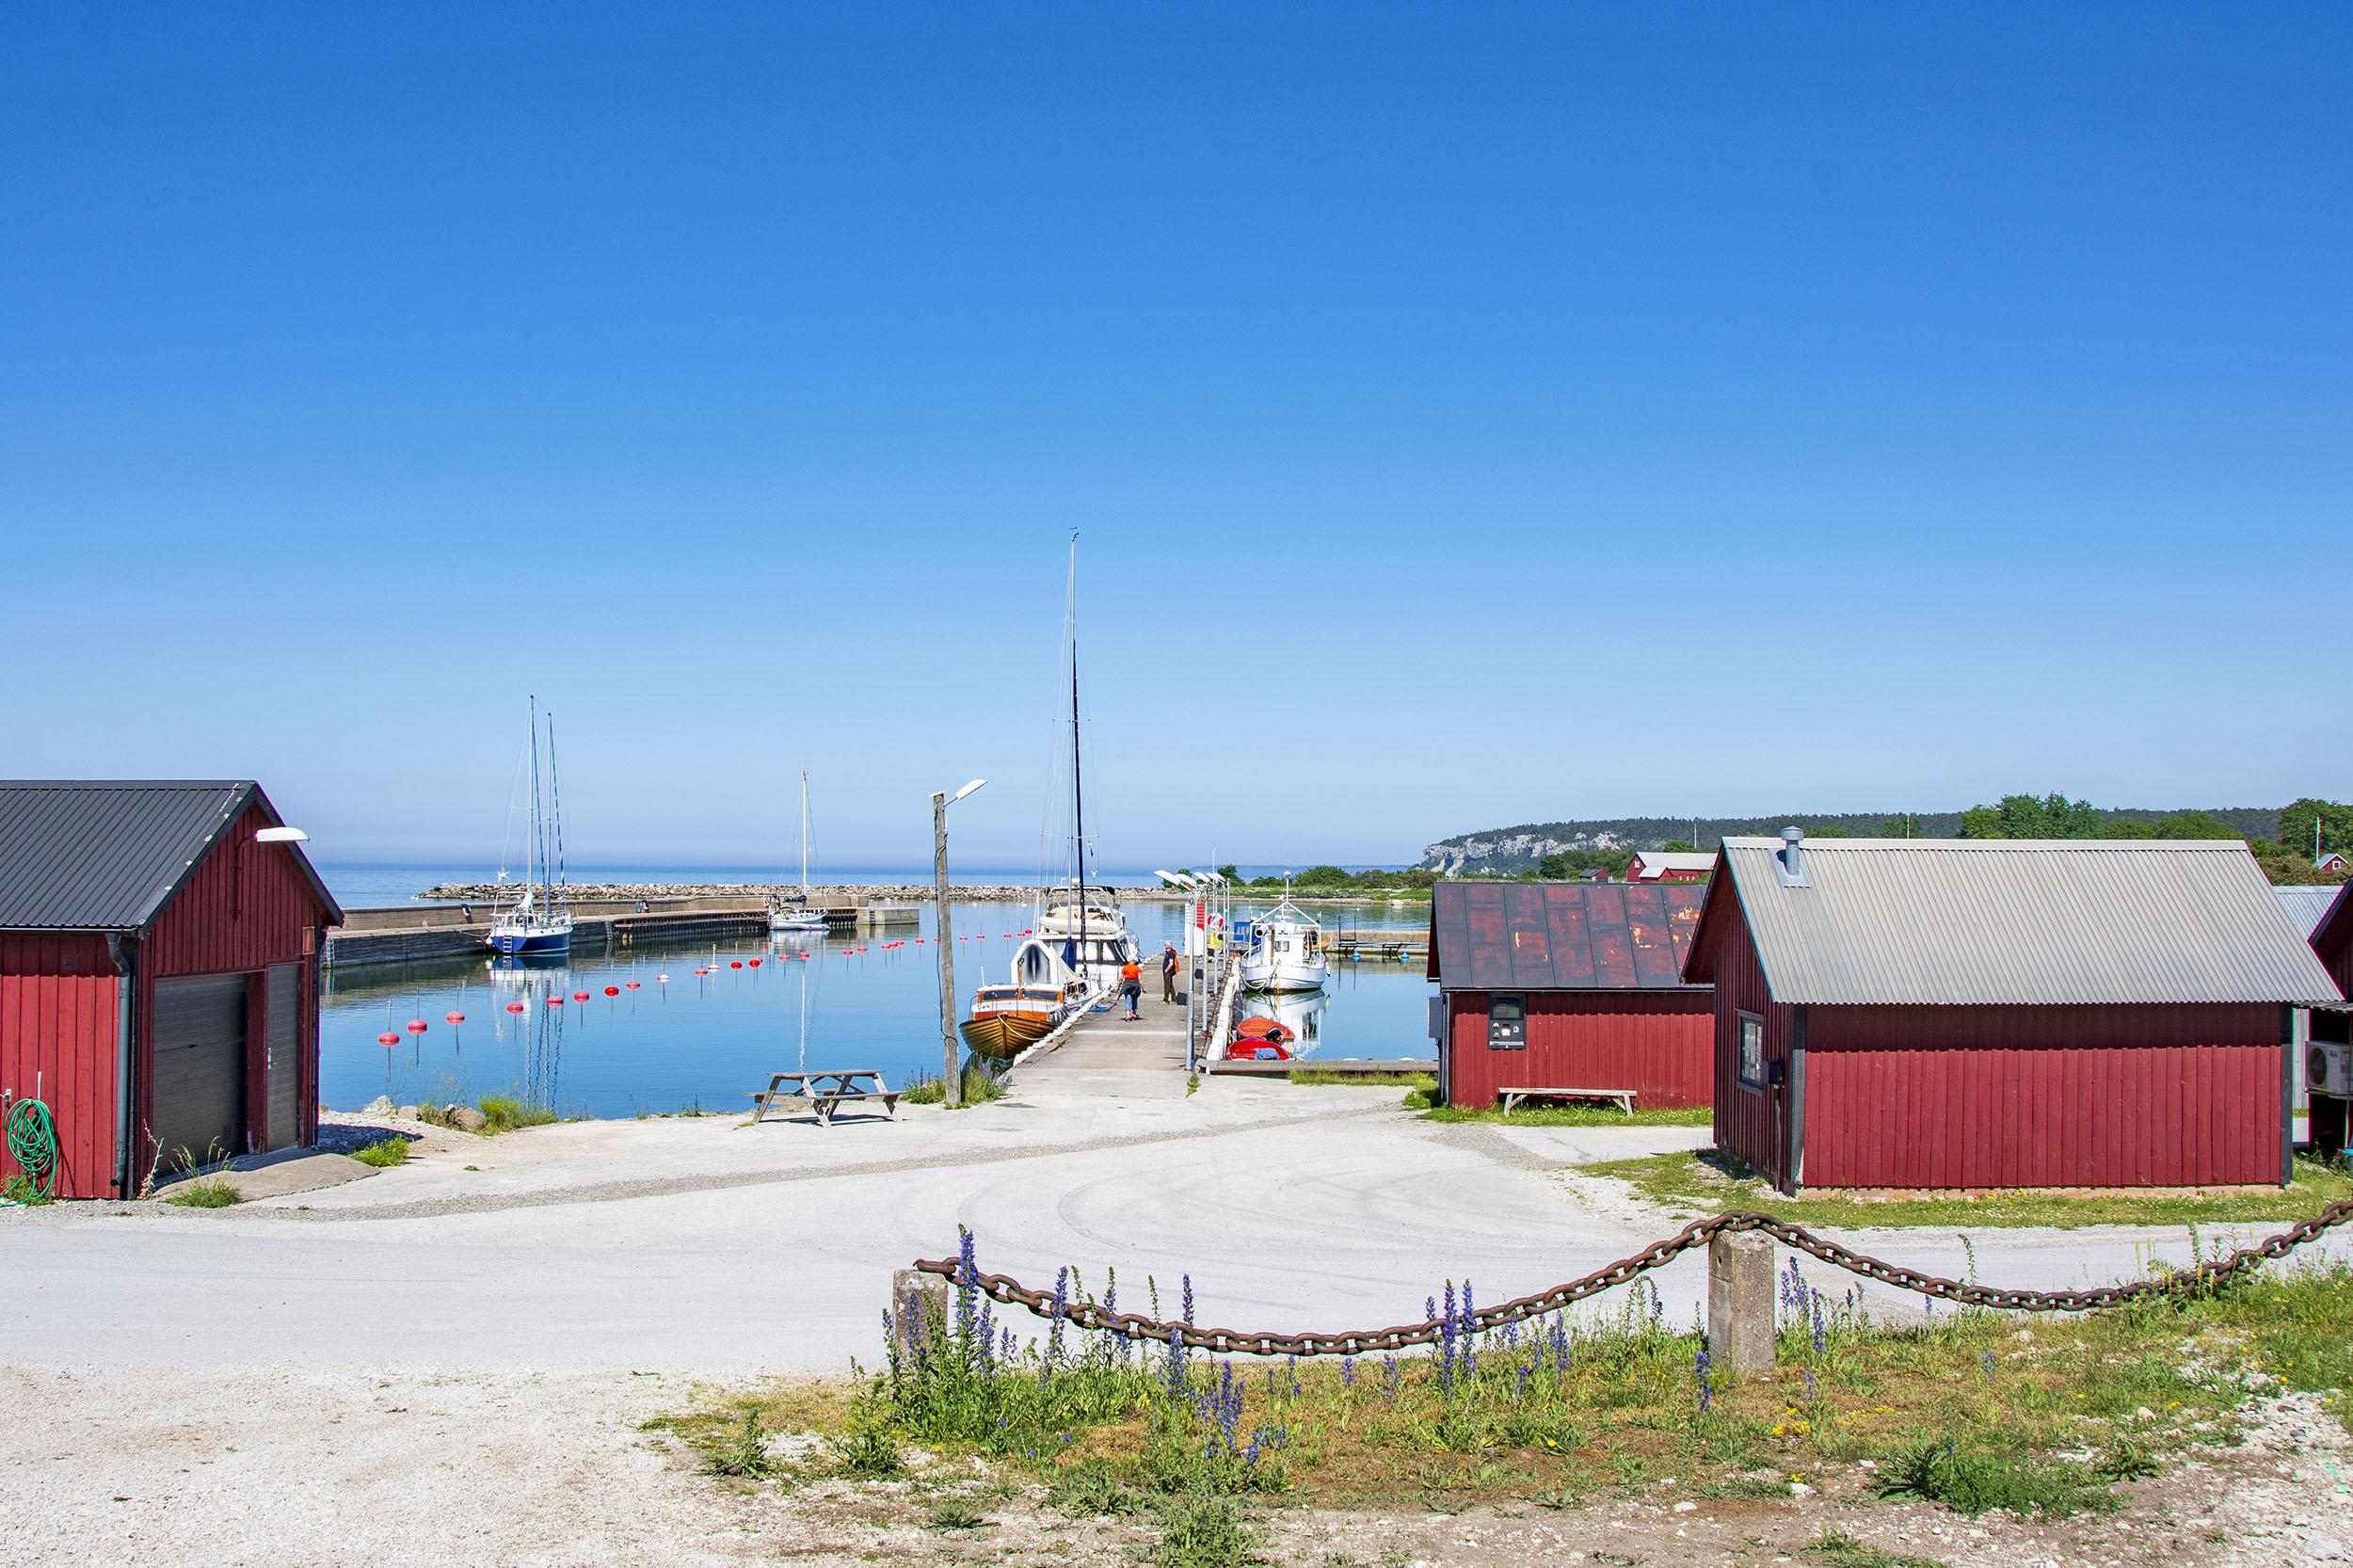 Lickershamn Gotland